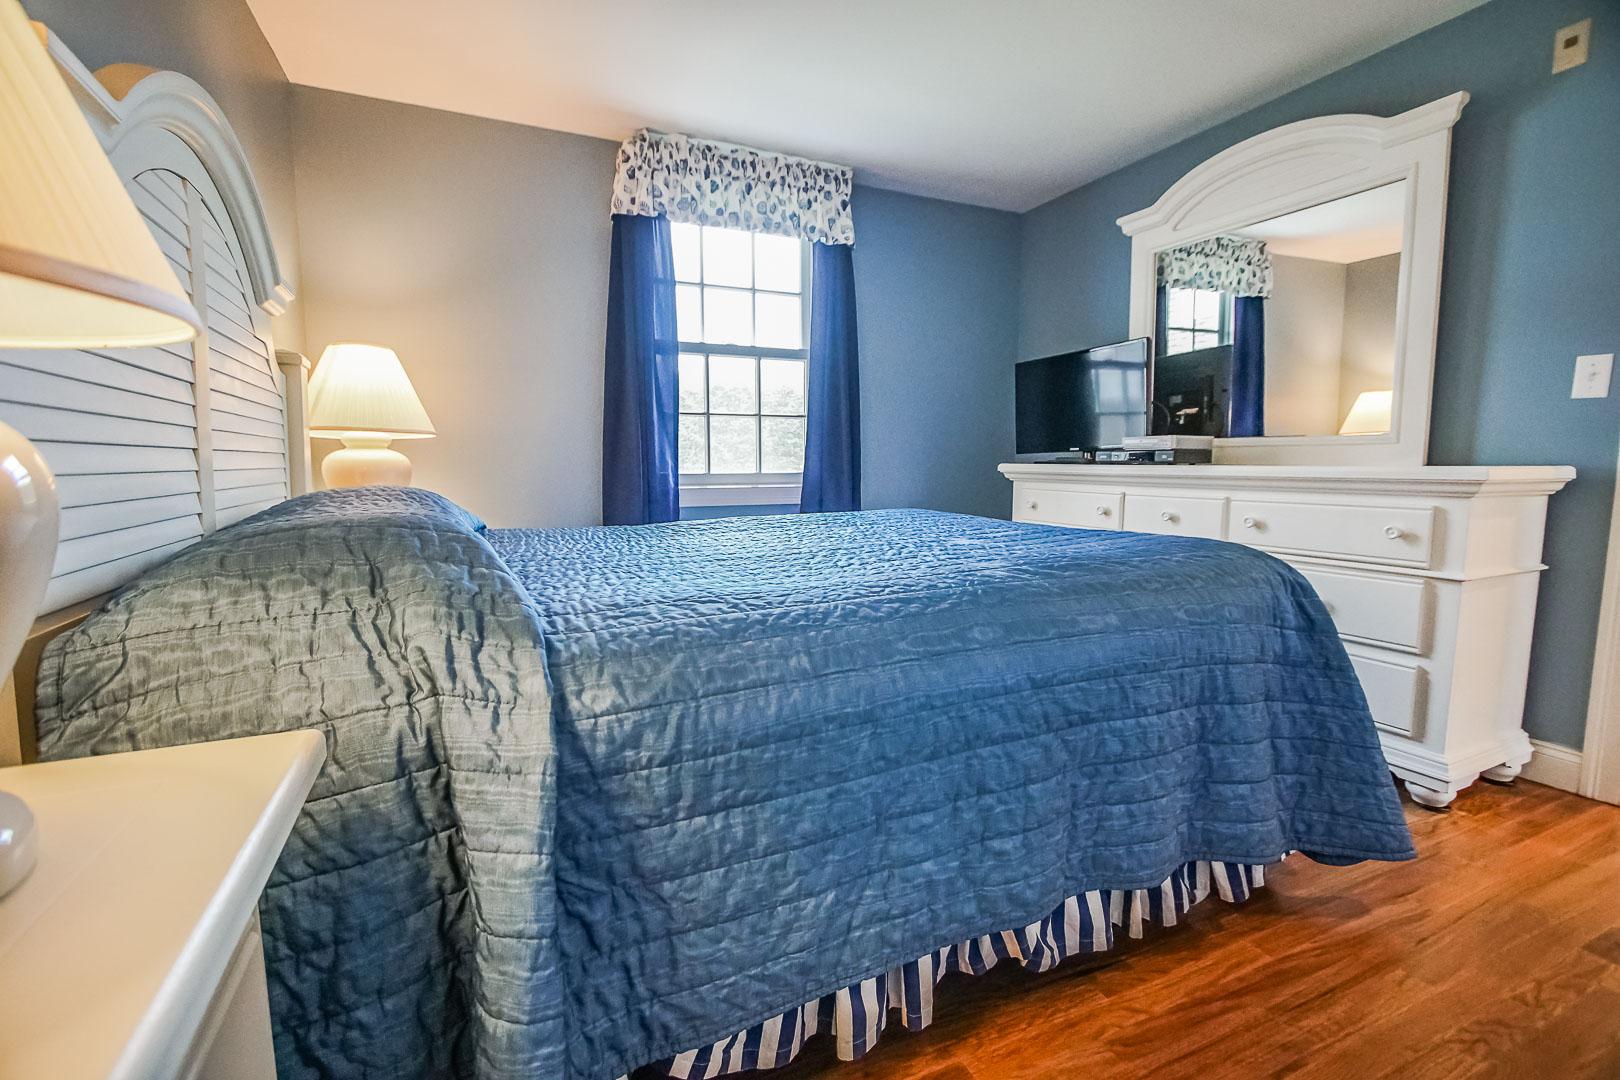 A cozy bedroom at VRI's Beachside Village Resort in Massachusetts.